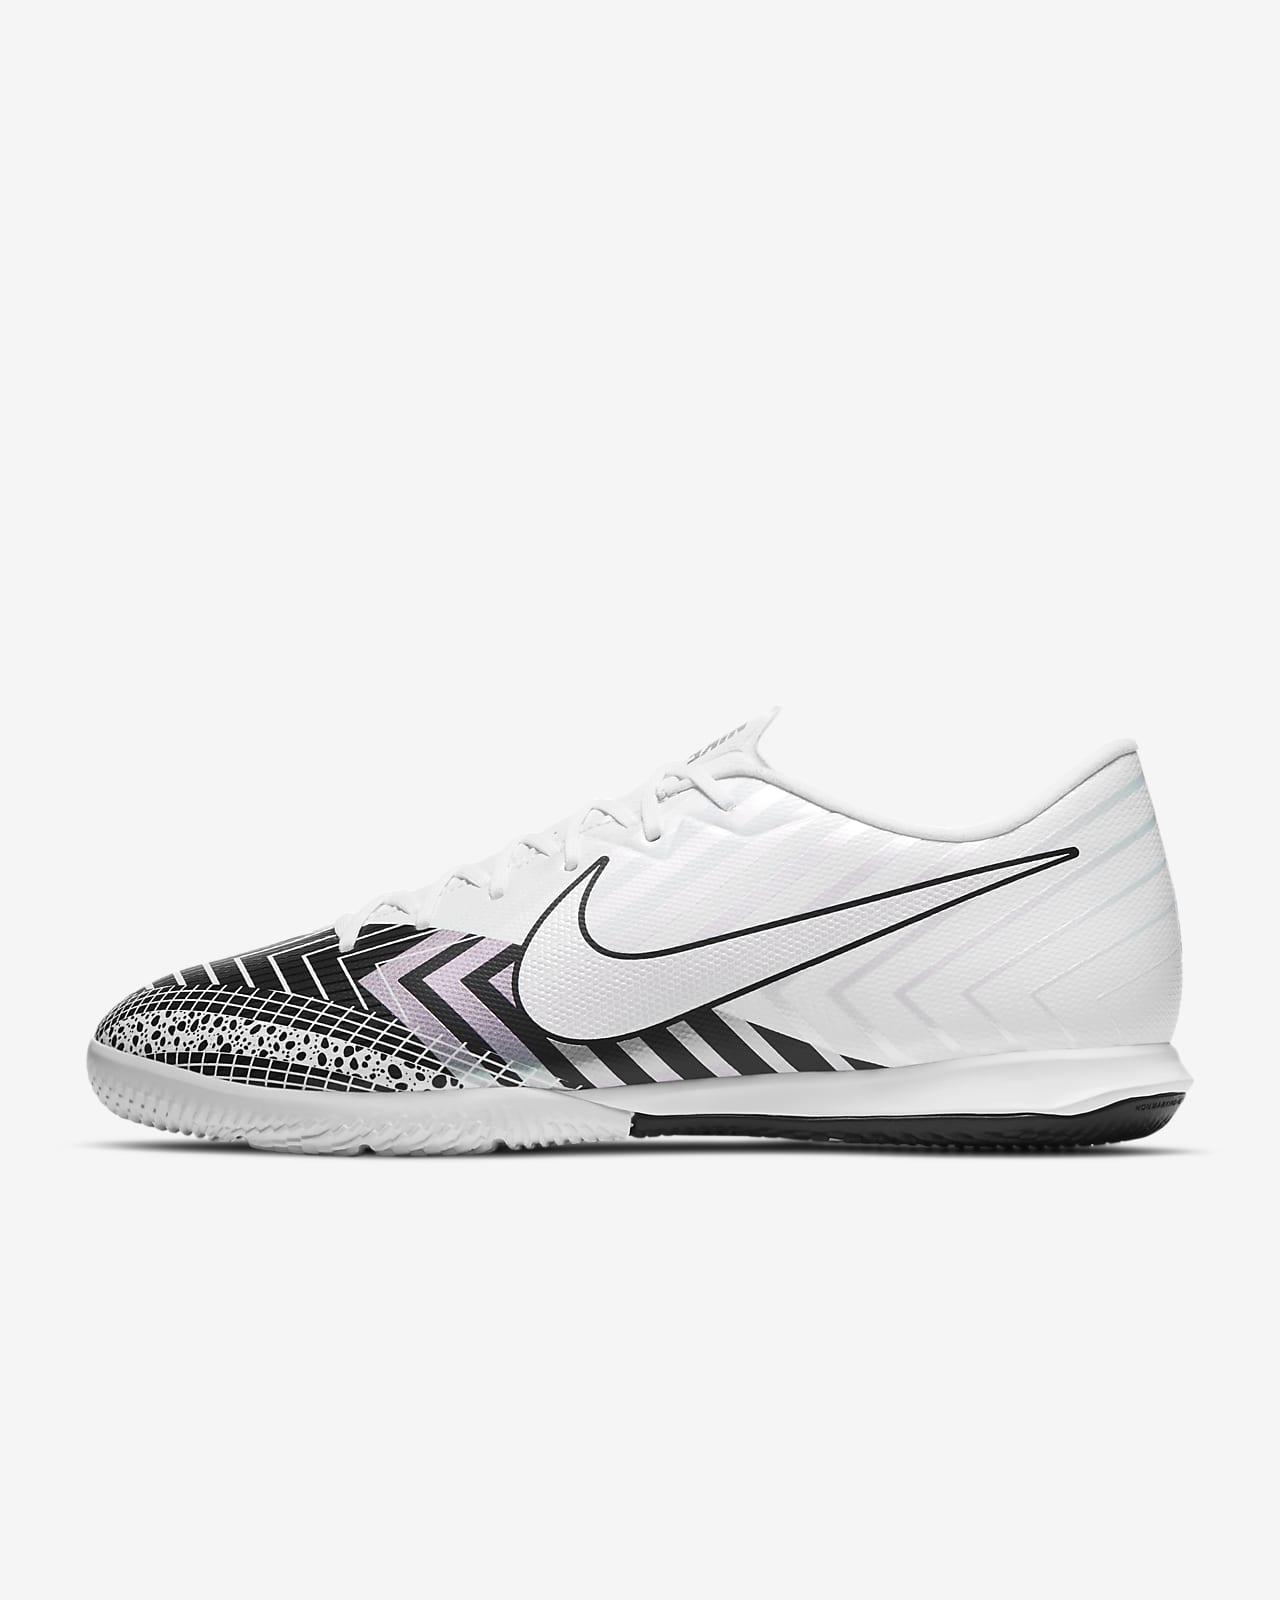 Nike Mercurial Vapor 13 Academy MDS IC 體育館/路面足球鞋